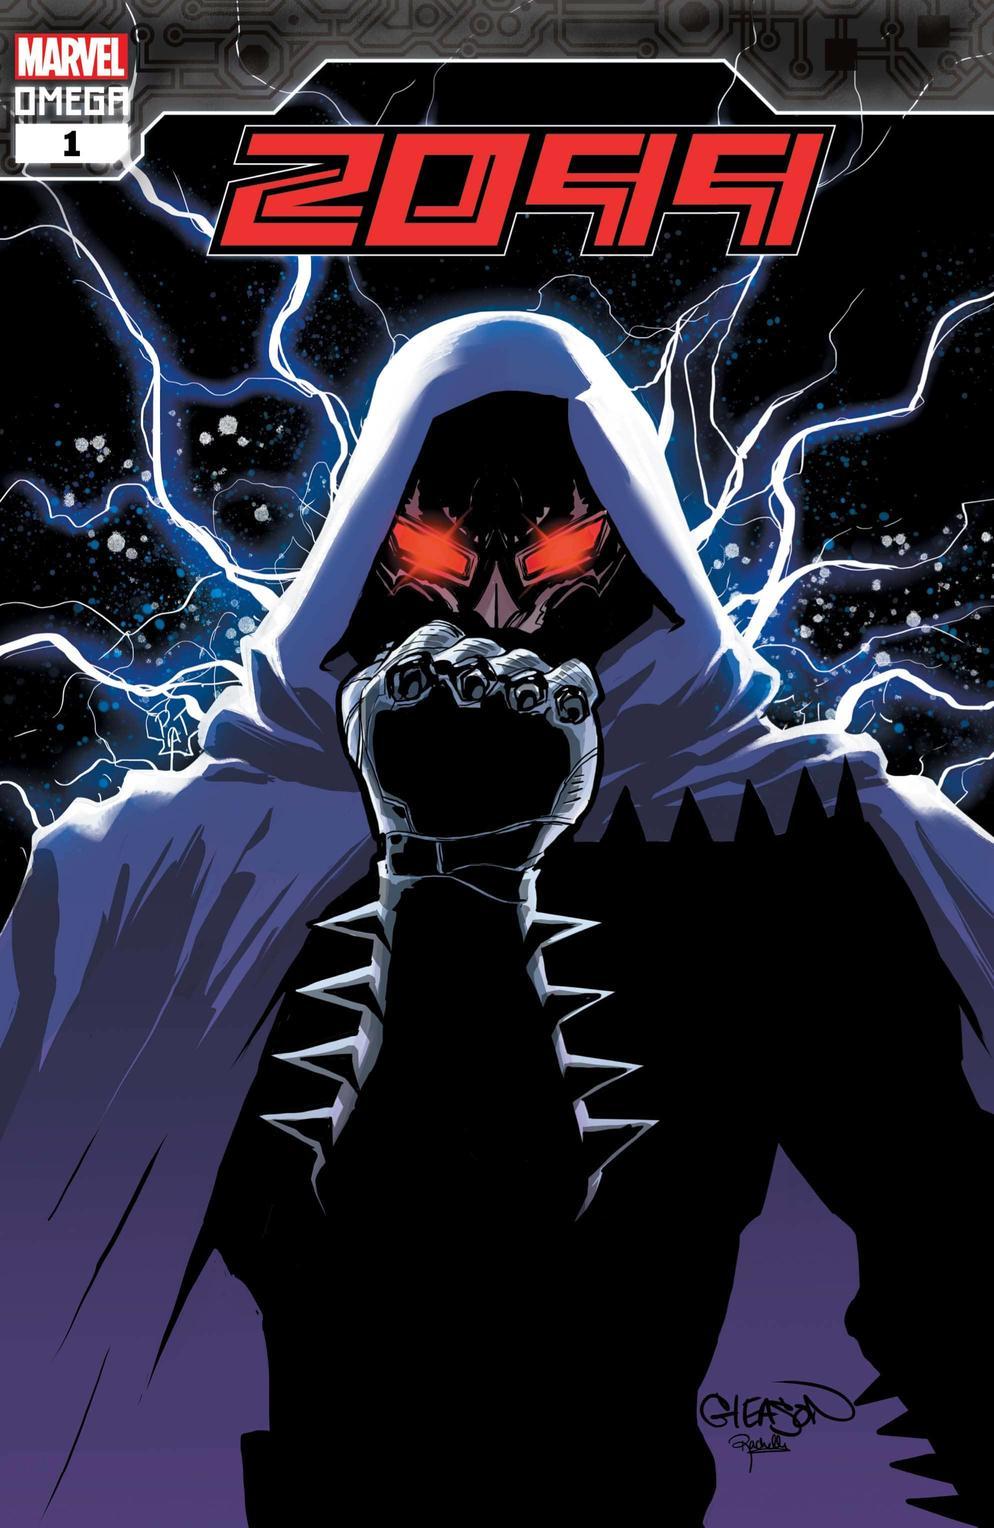 2099 Omega #1, copertina di Patrick Gleason